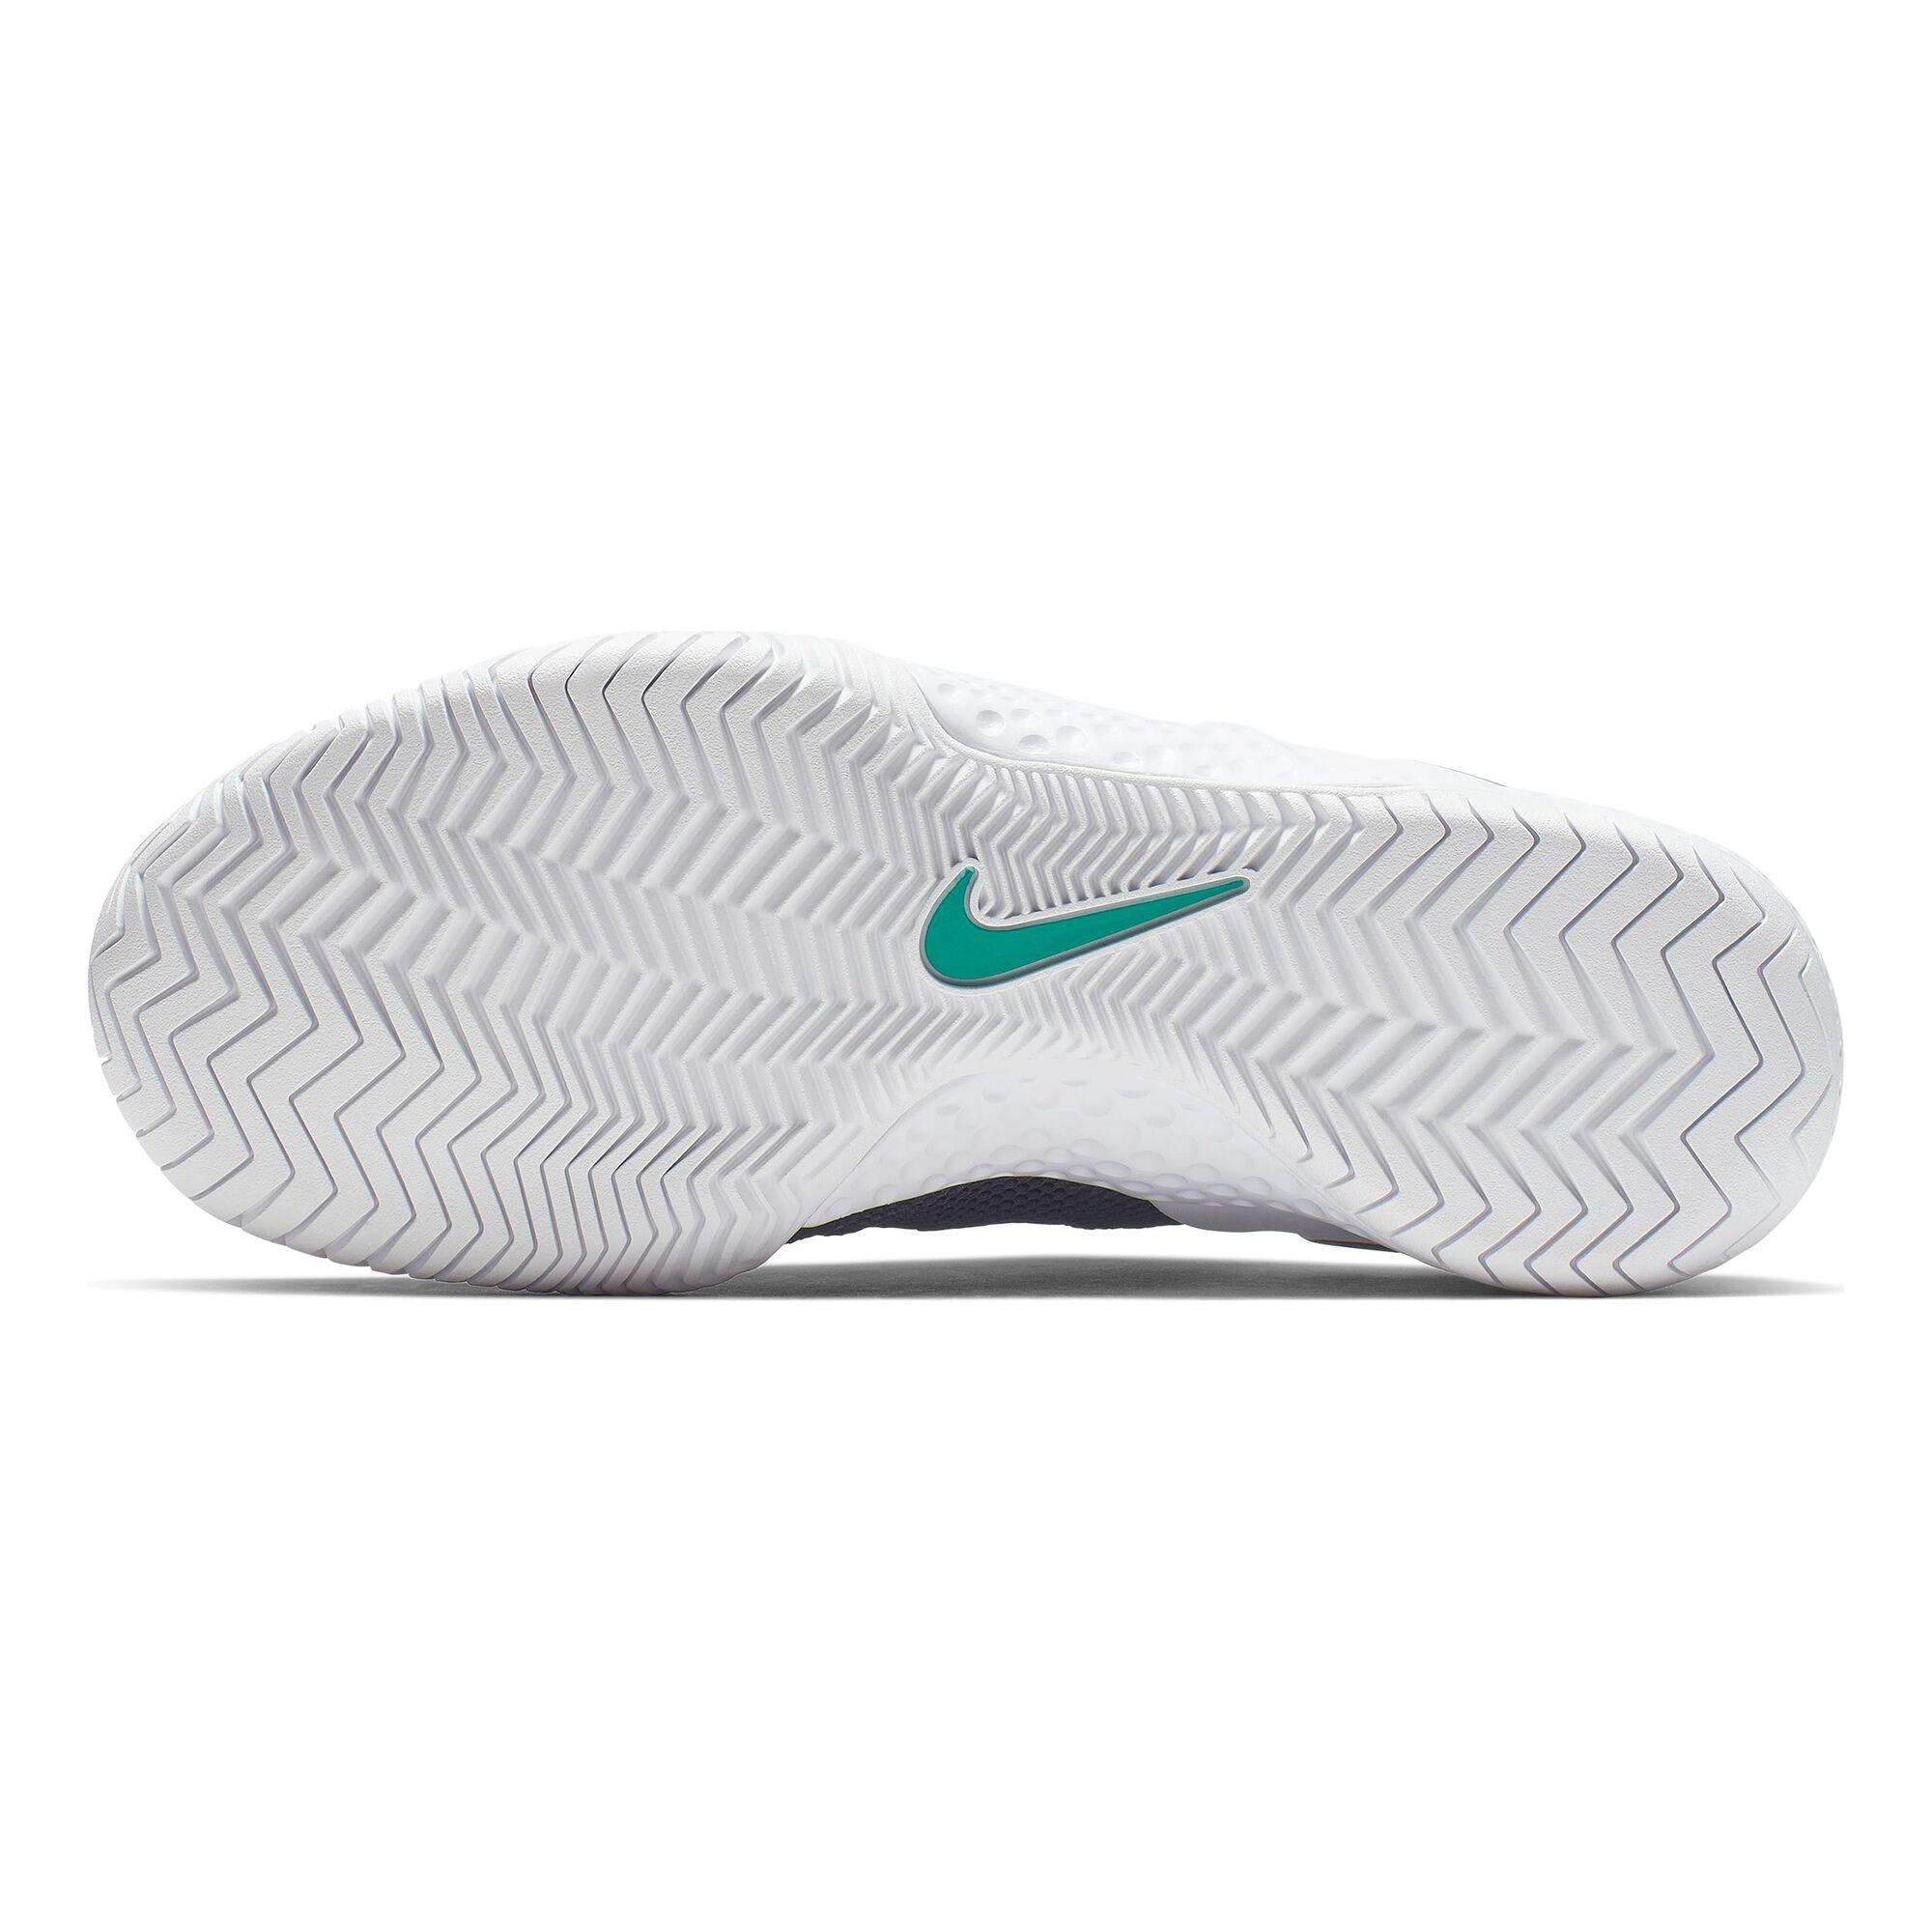 c24959ddc69 Nike Flare 2 HC Allcourt Schoen Dames - Wit, Zwart online kopen ...